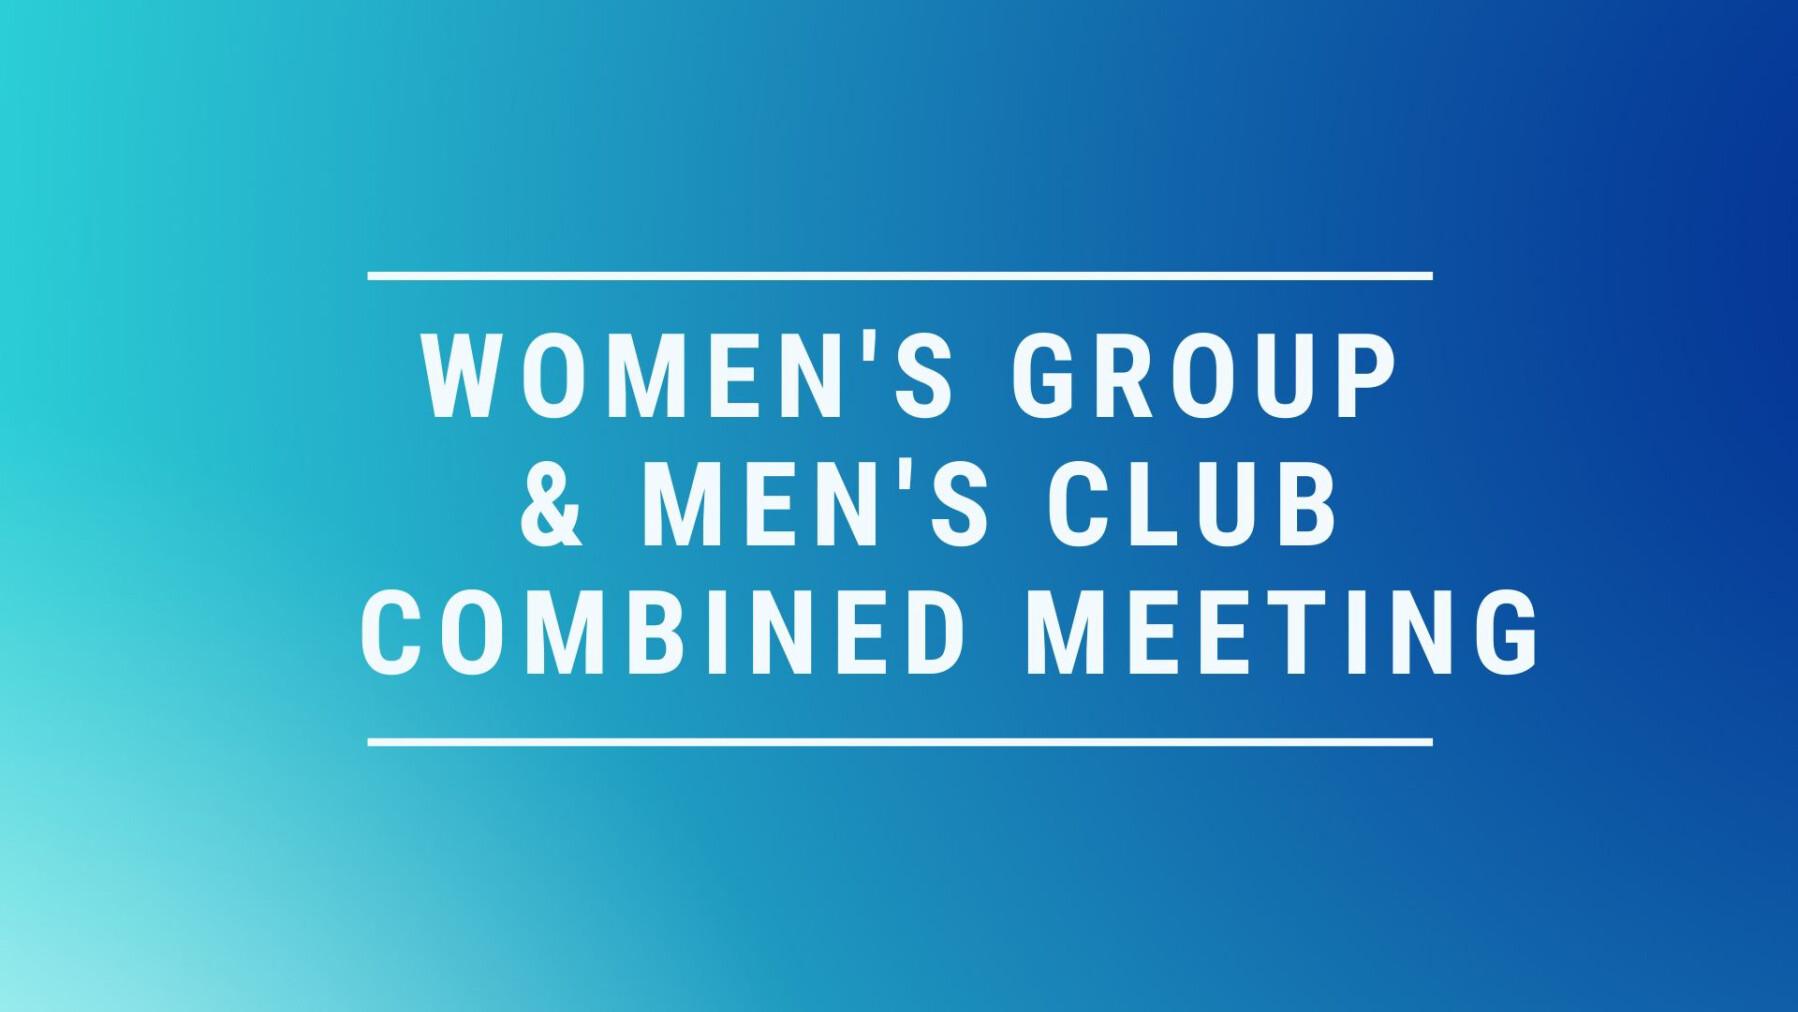 Women's Group & Men's Club Combined Meeting